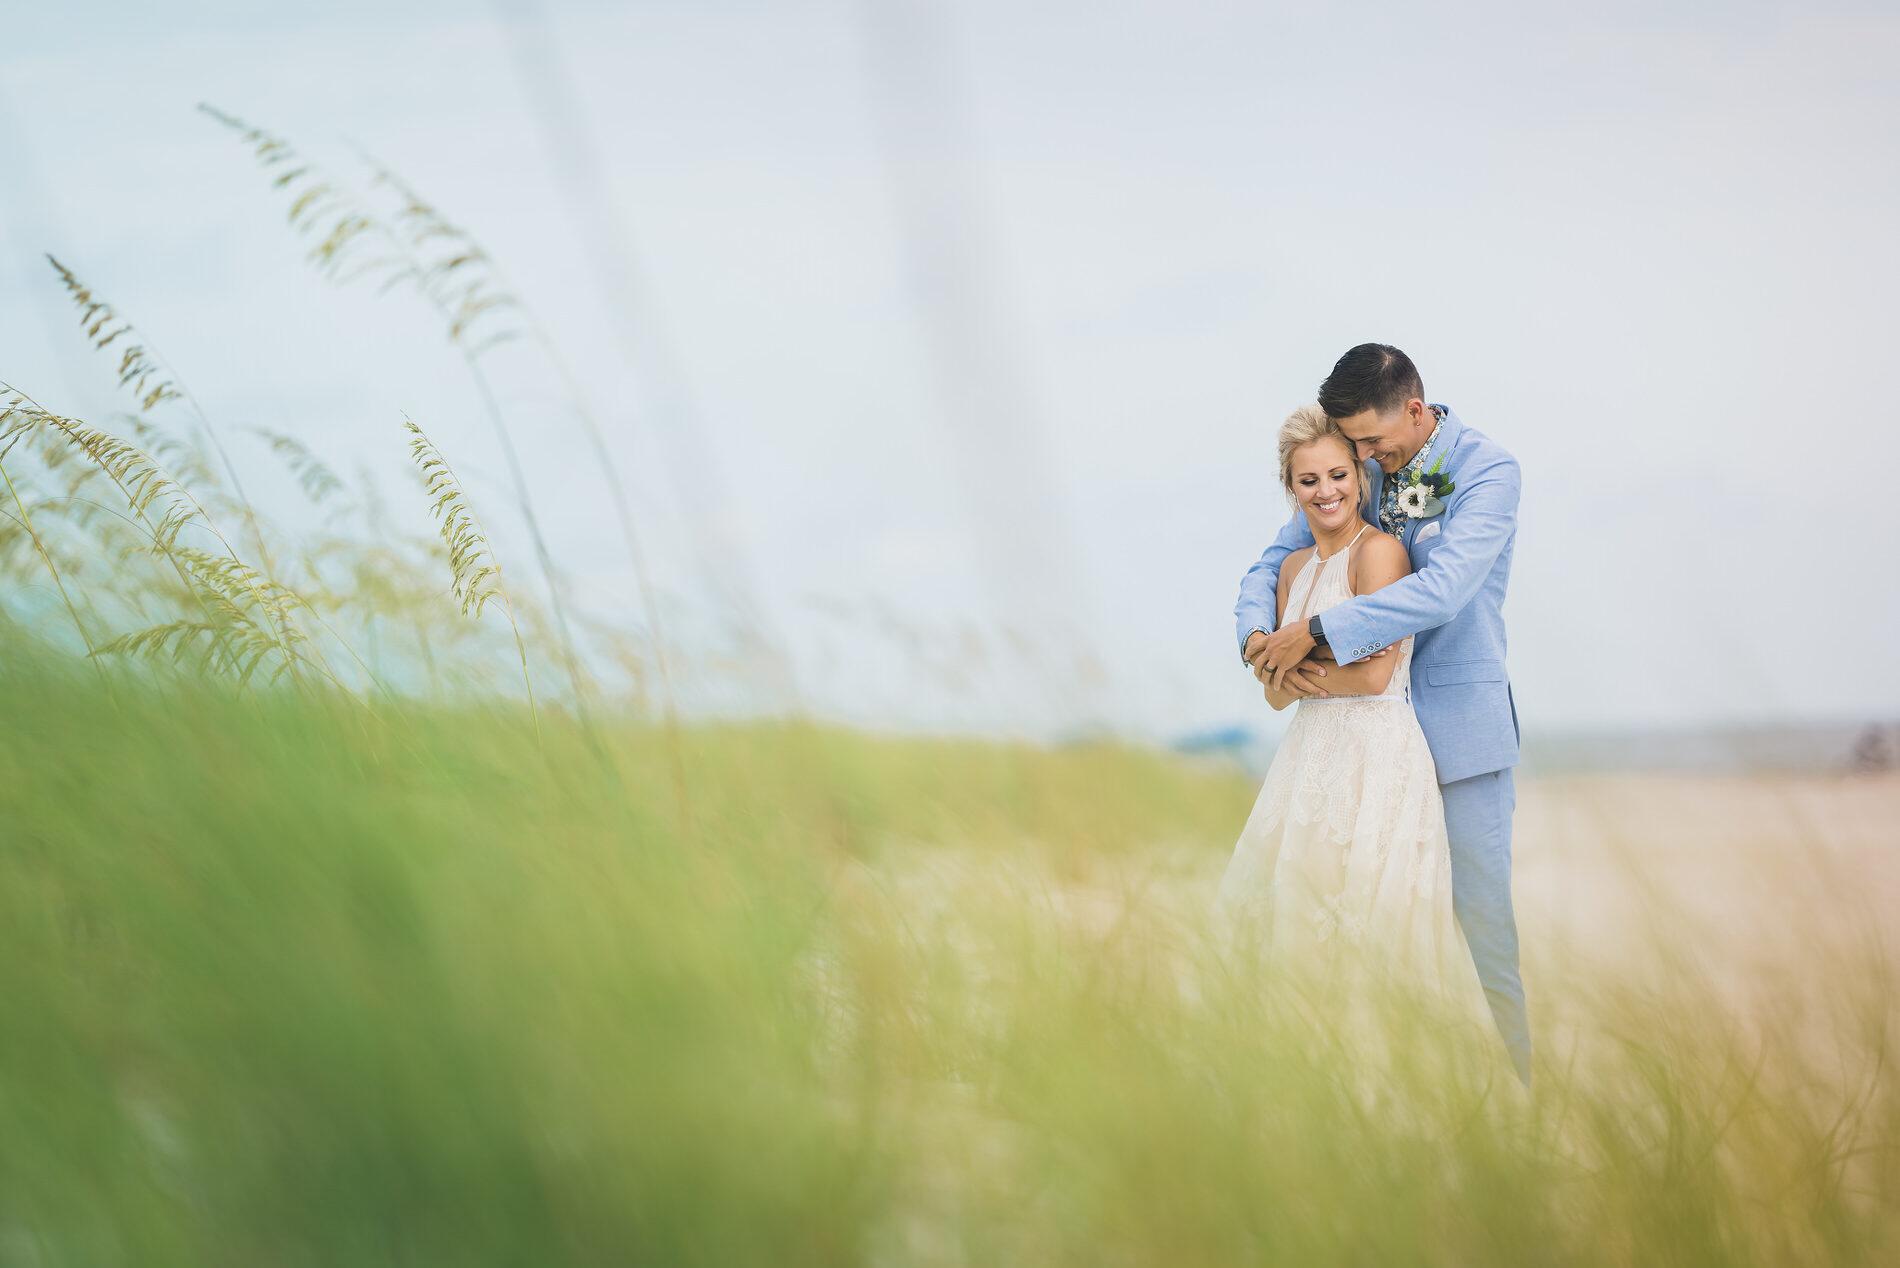 Wedding Photography at Wild Dunes Beach